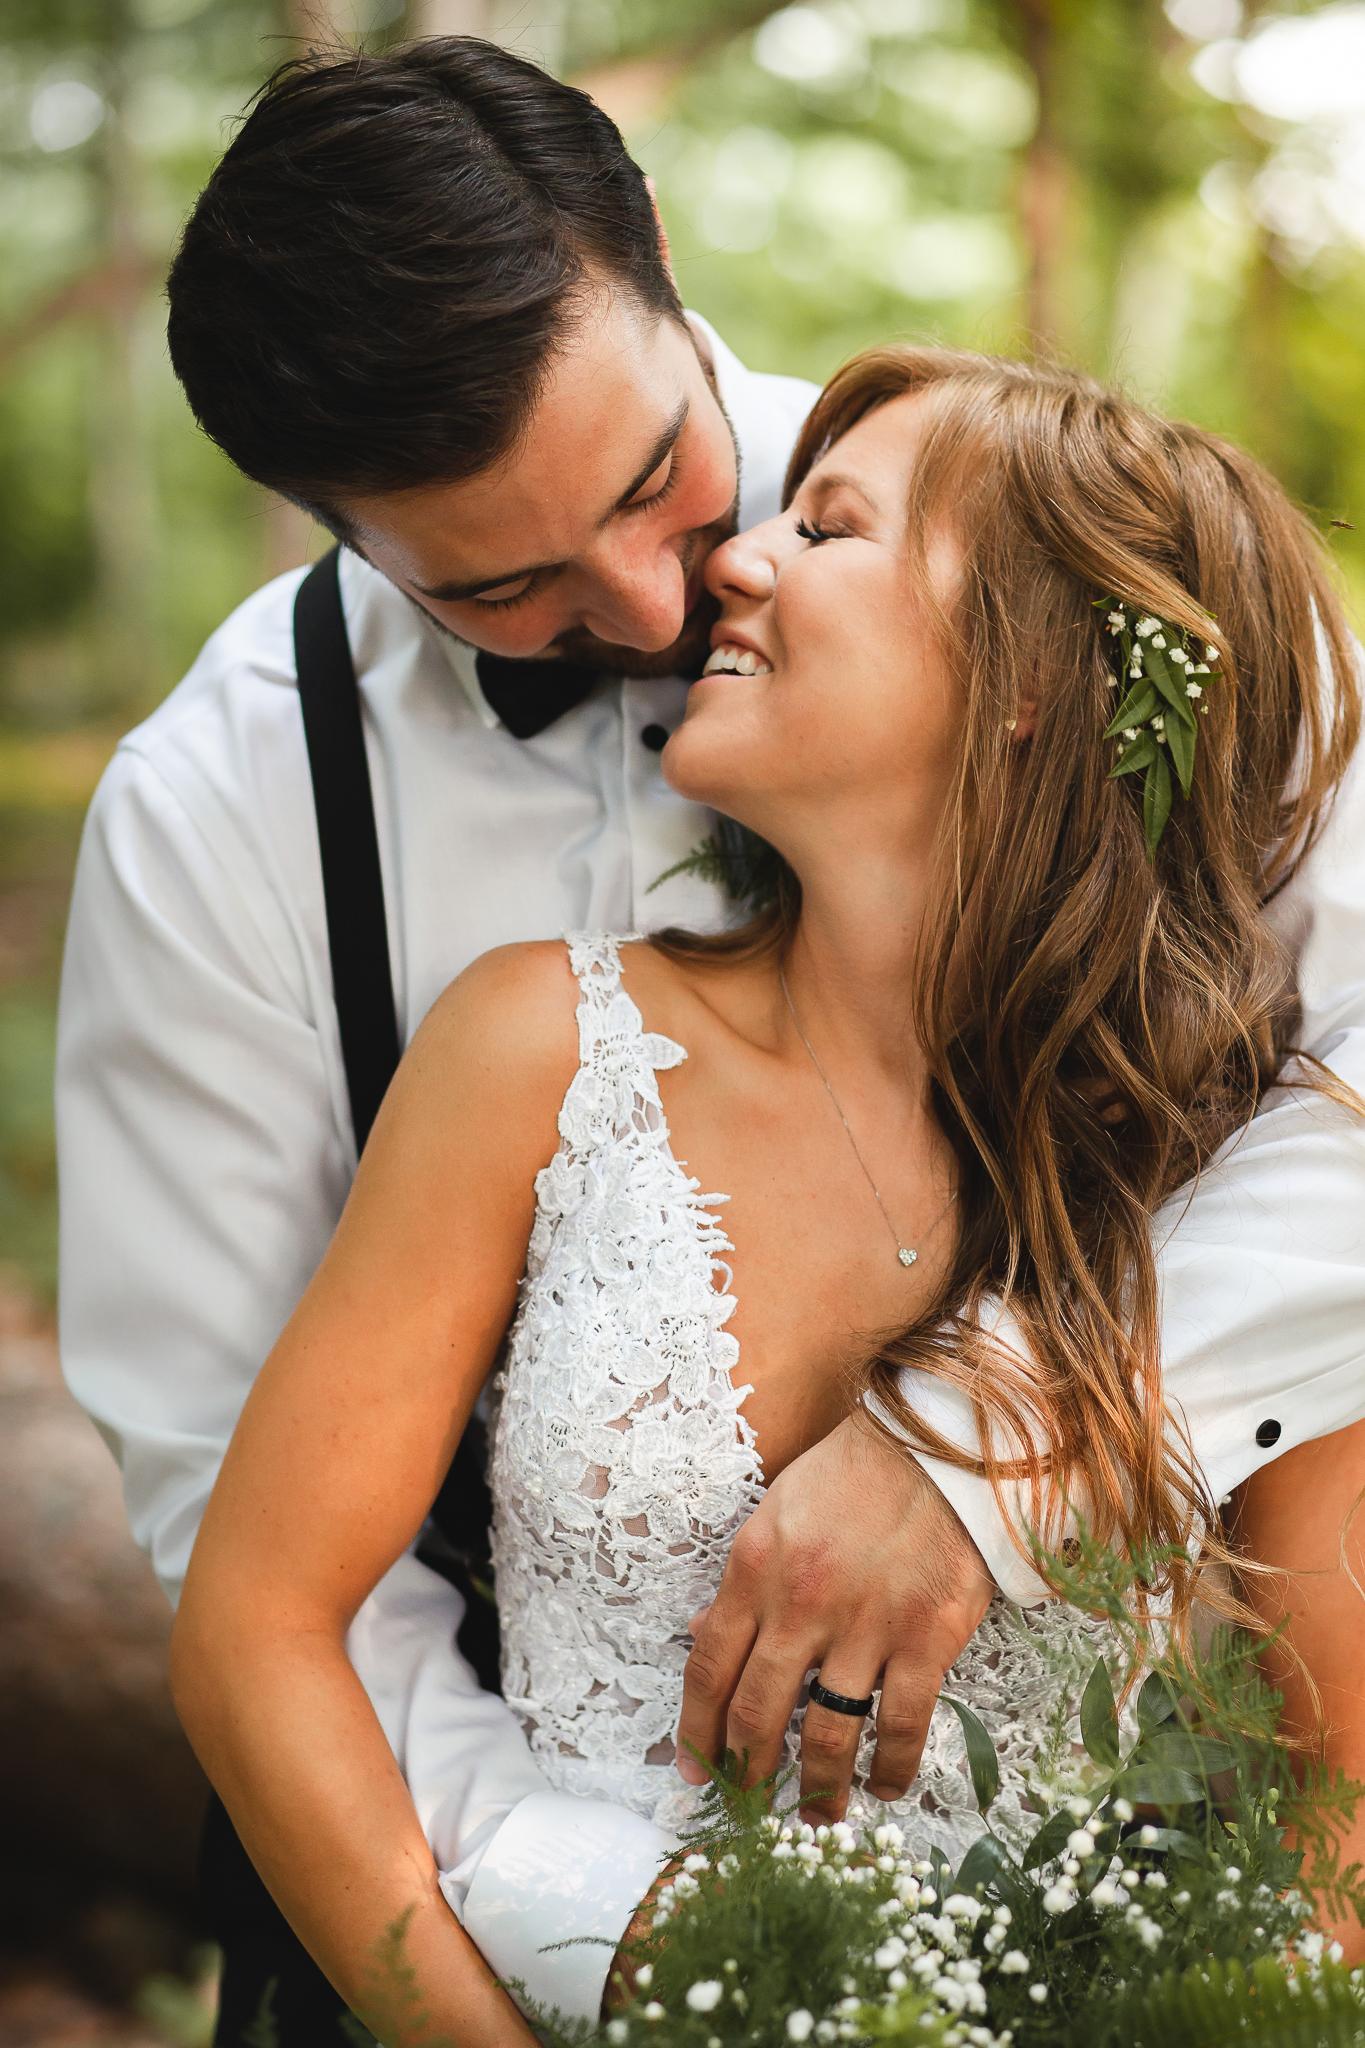 Amy+D+Photography-+Bride+and+Groom-+Wedding+Poses-+Muskoka+Wedding-+Barrie+Wedding+Photographer-+Best+Wedding+Photographer-+Muskoka+Wedding+Photography-+Bride+Pose-+Groom+Pose-33.jpg